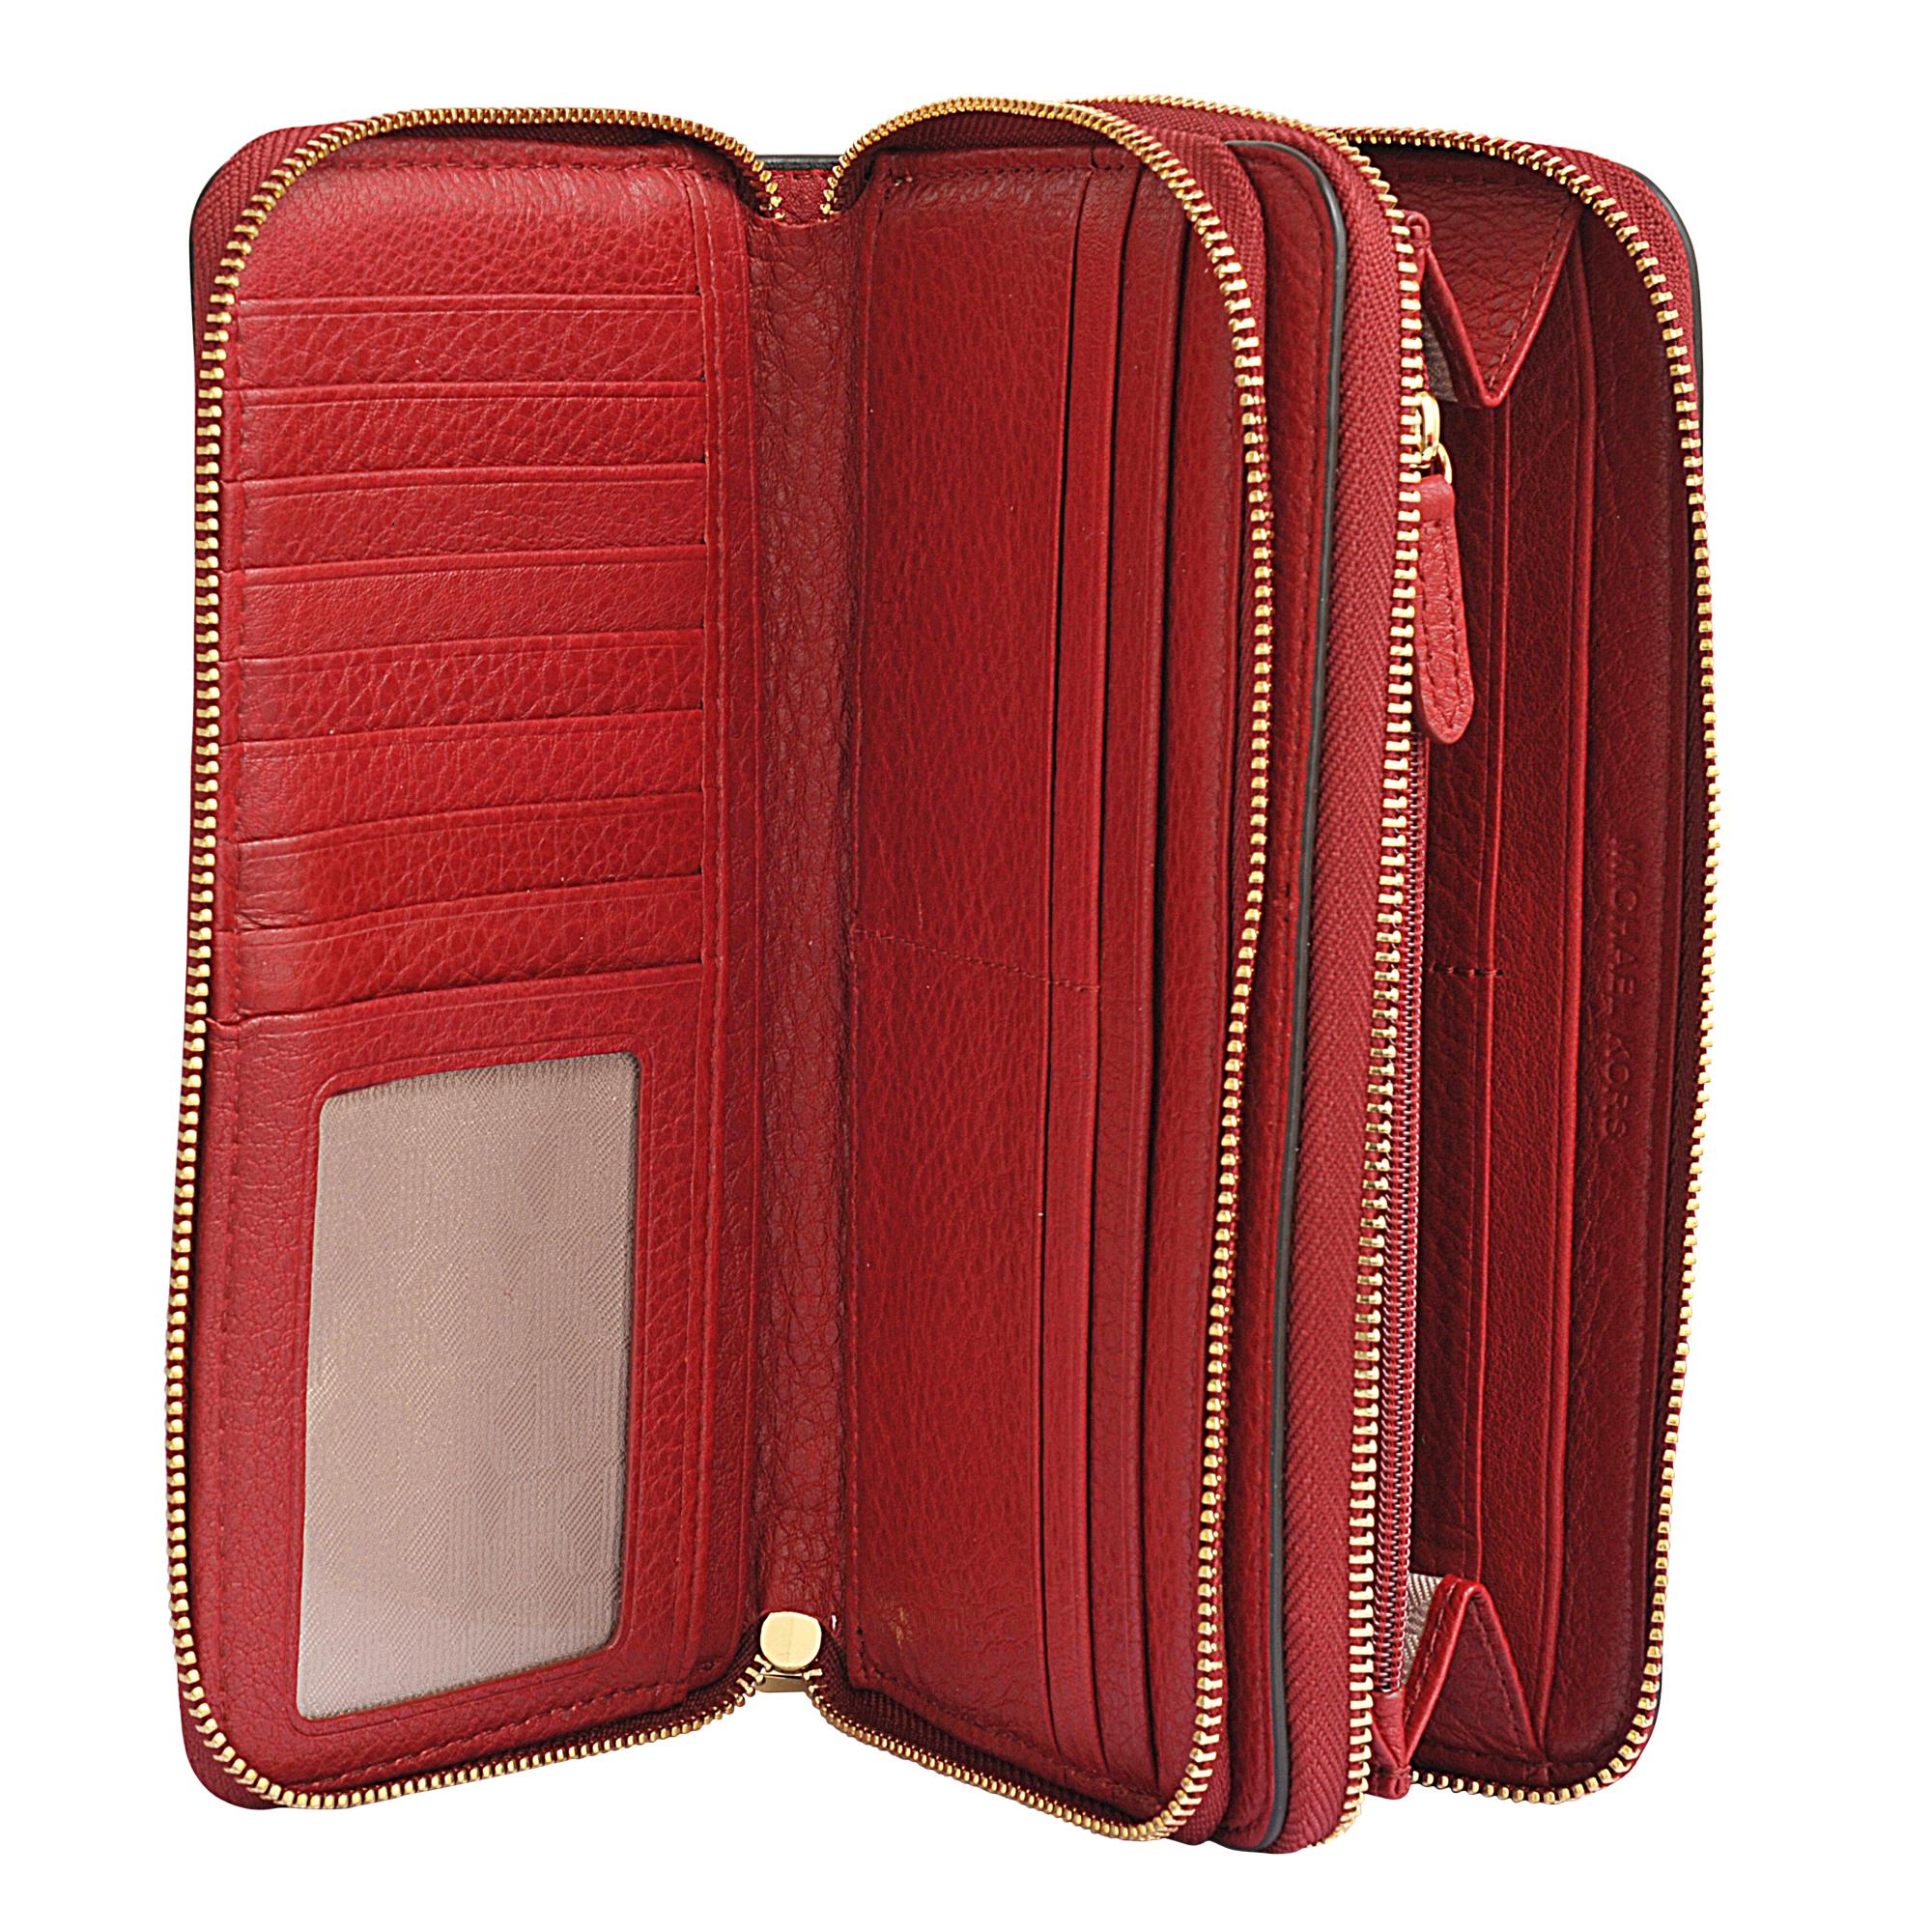 fe784234173769 MICHAEL Michael Kors Adele Double Zip Wallet in Red - Lyst